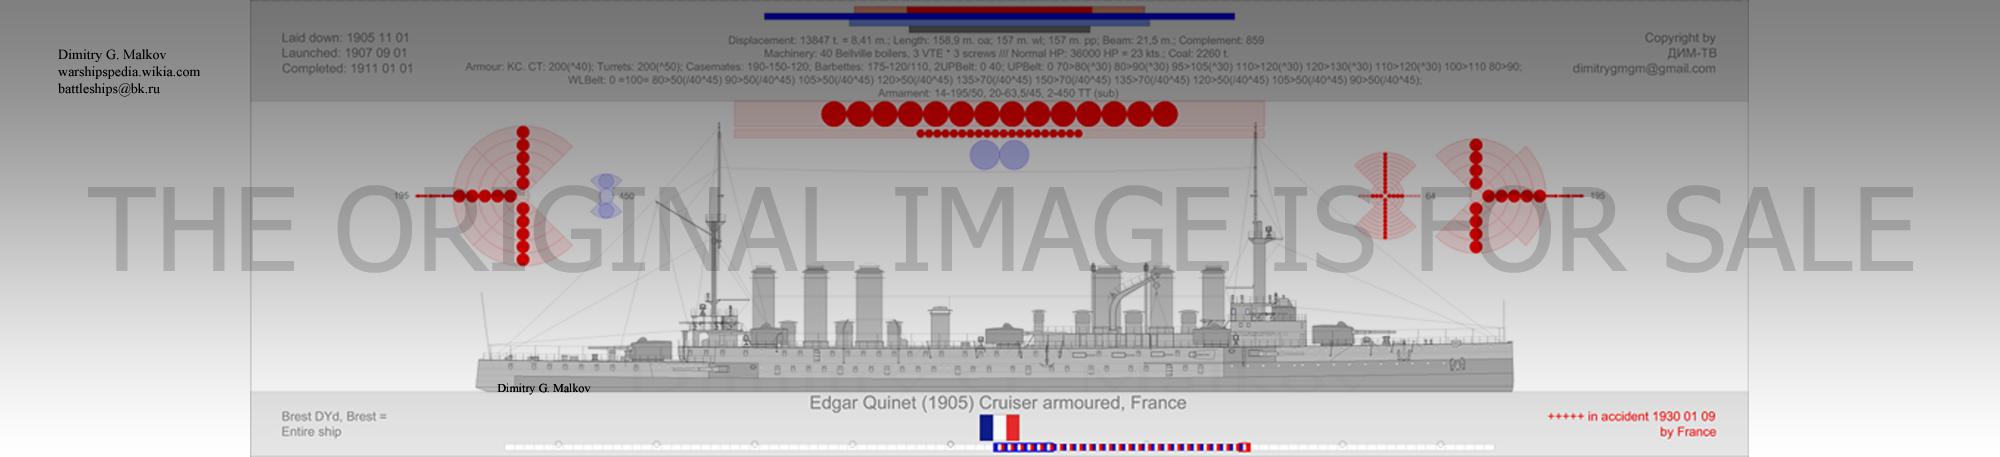 Mes dessins de navires français et de construction française - Page 14 Ca-19017